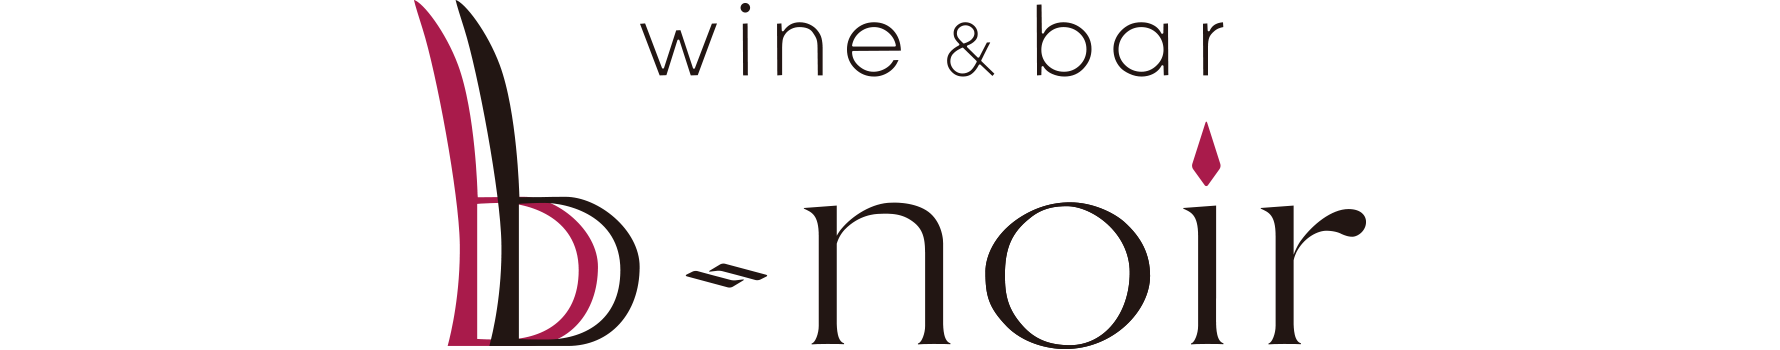 wine & bar b-noir 〜ソムリエ・バーテンダー専門〜【ビーノワール】(六本木)のロゴ